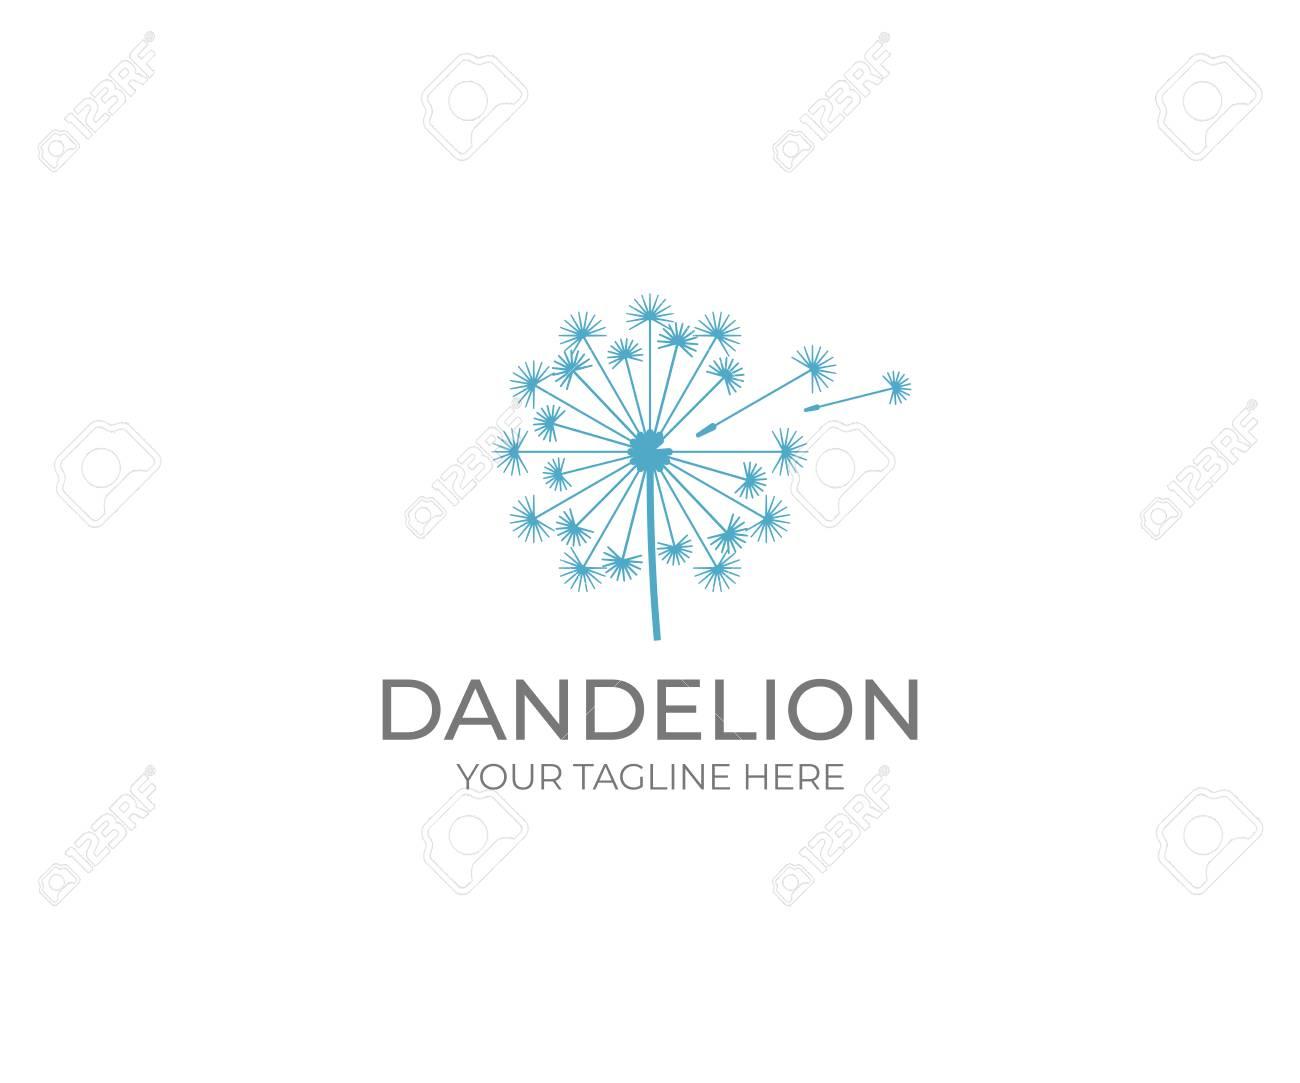 Dandelion logo template. Taraxacum flower vector design. Blowball illustration - 95888810